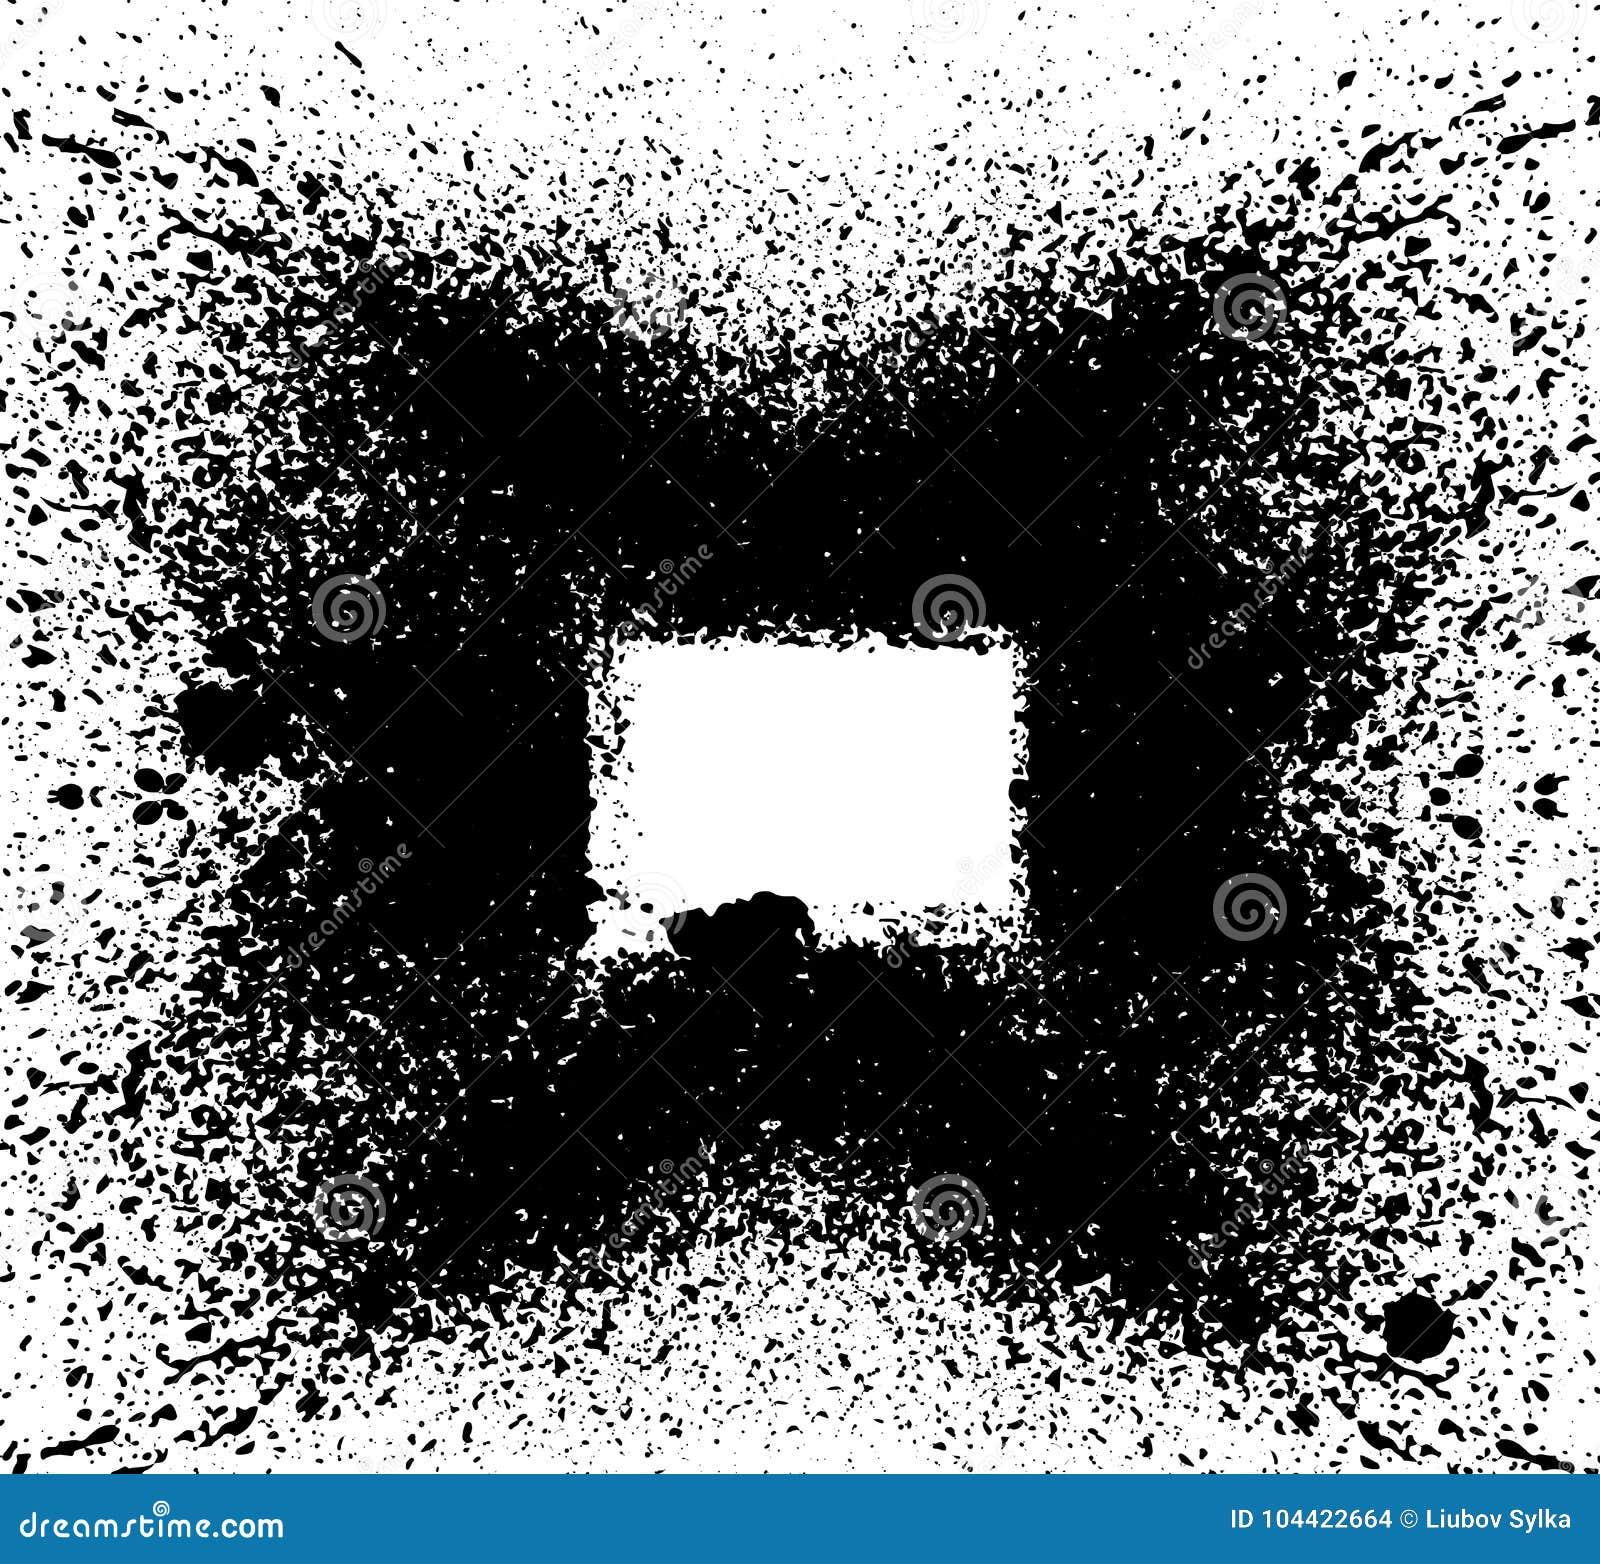 Black paint, ink splash, brushes ink droplets, blots. Dirty artistic design elements, boxes, frames. Grunge frame with space for y